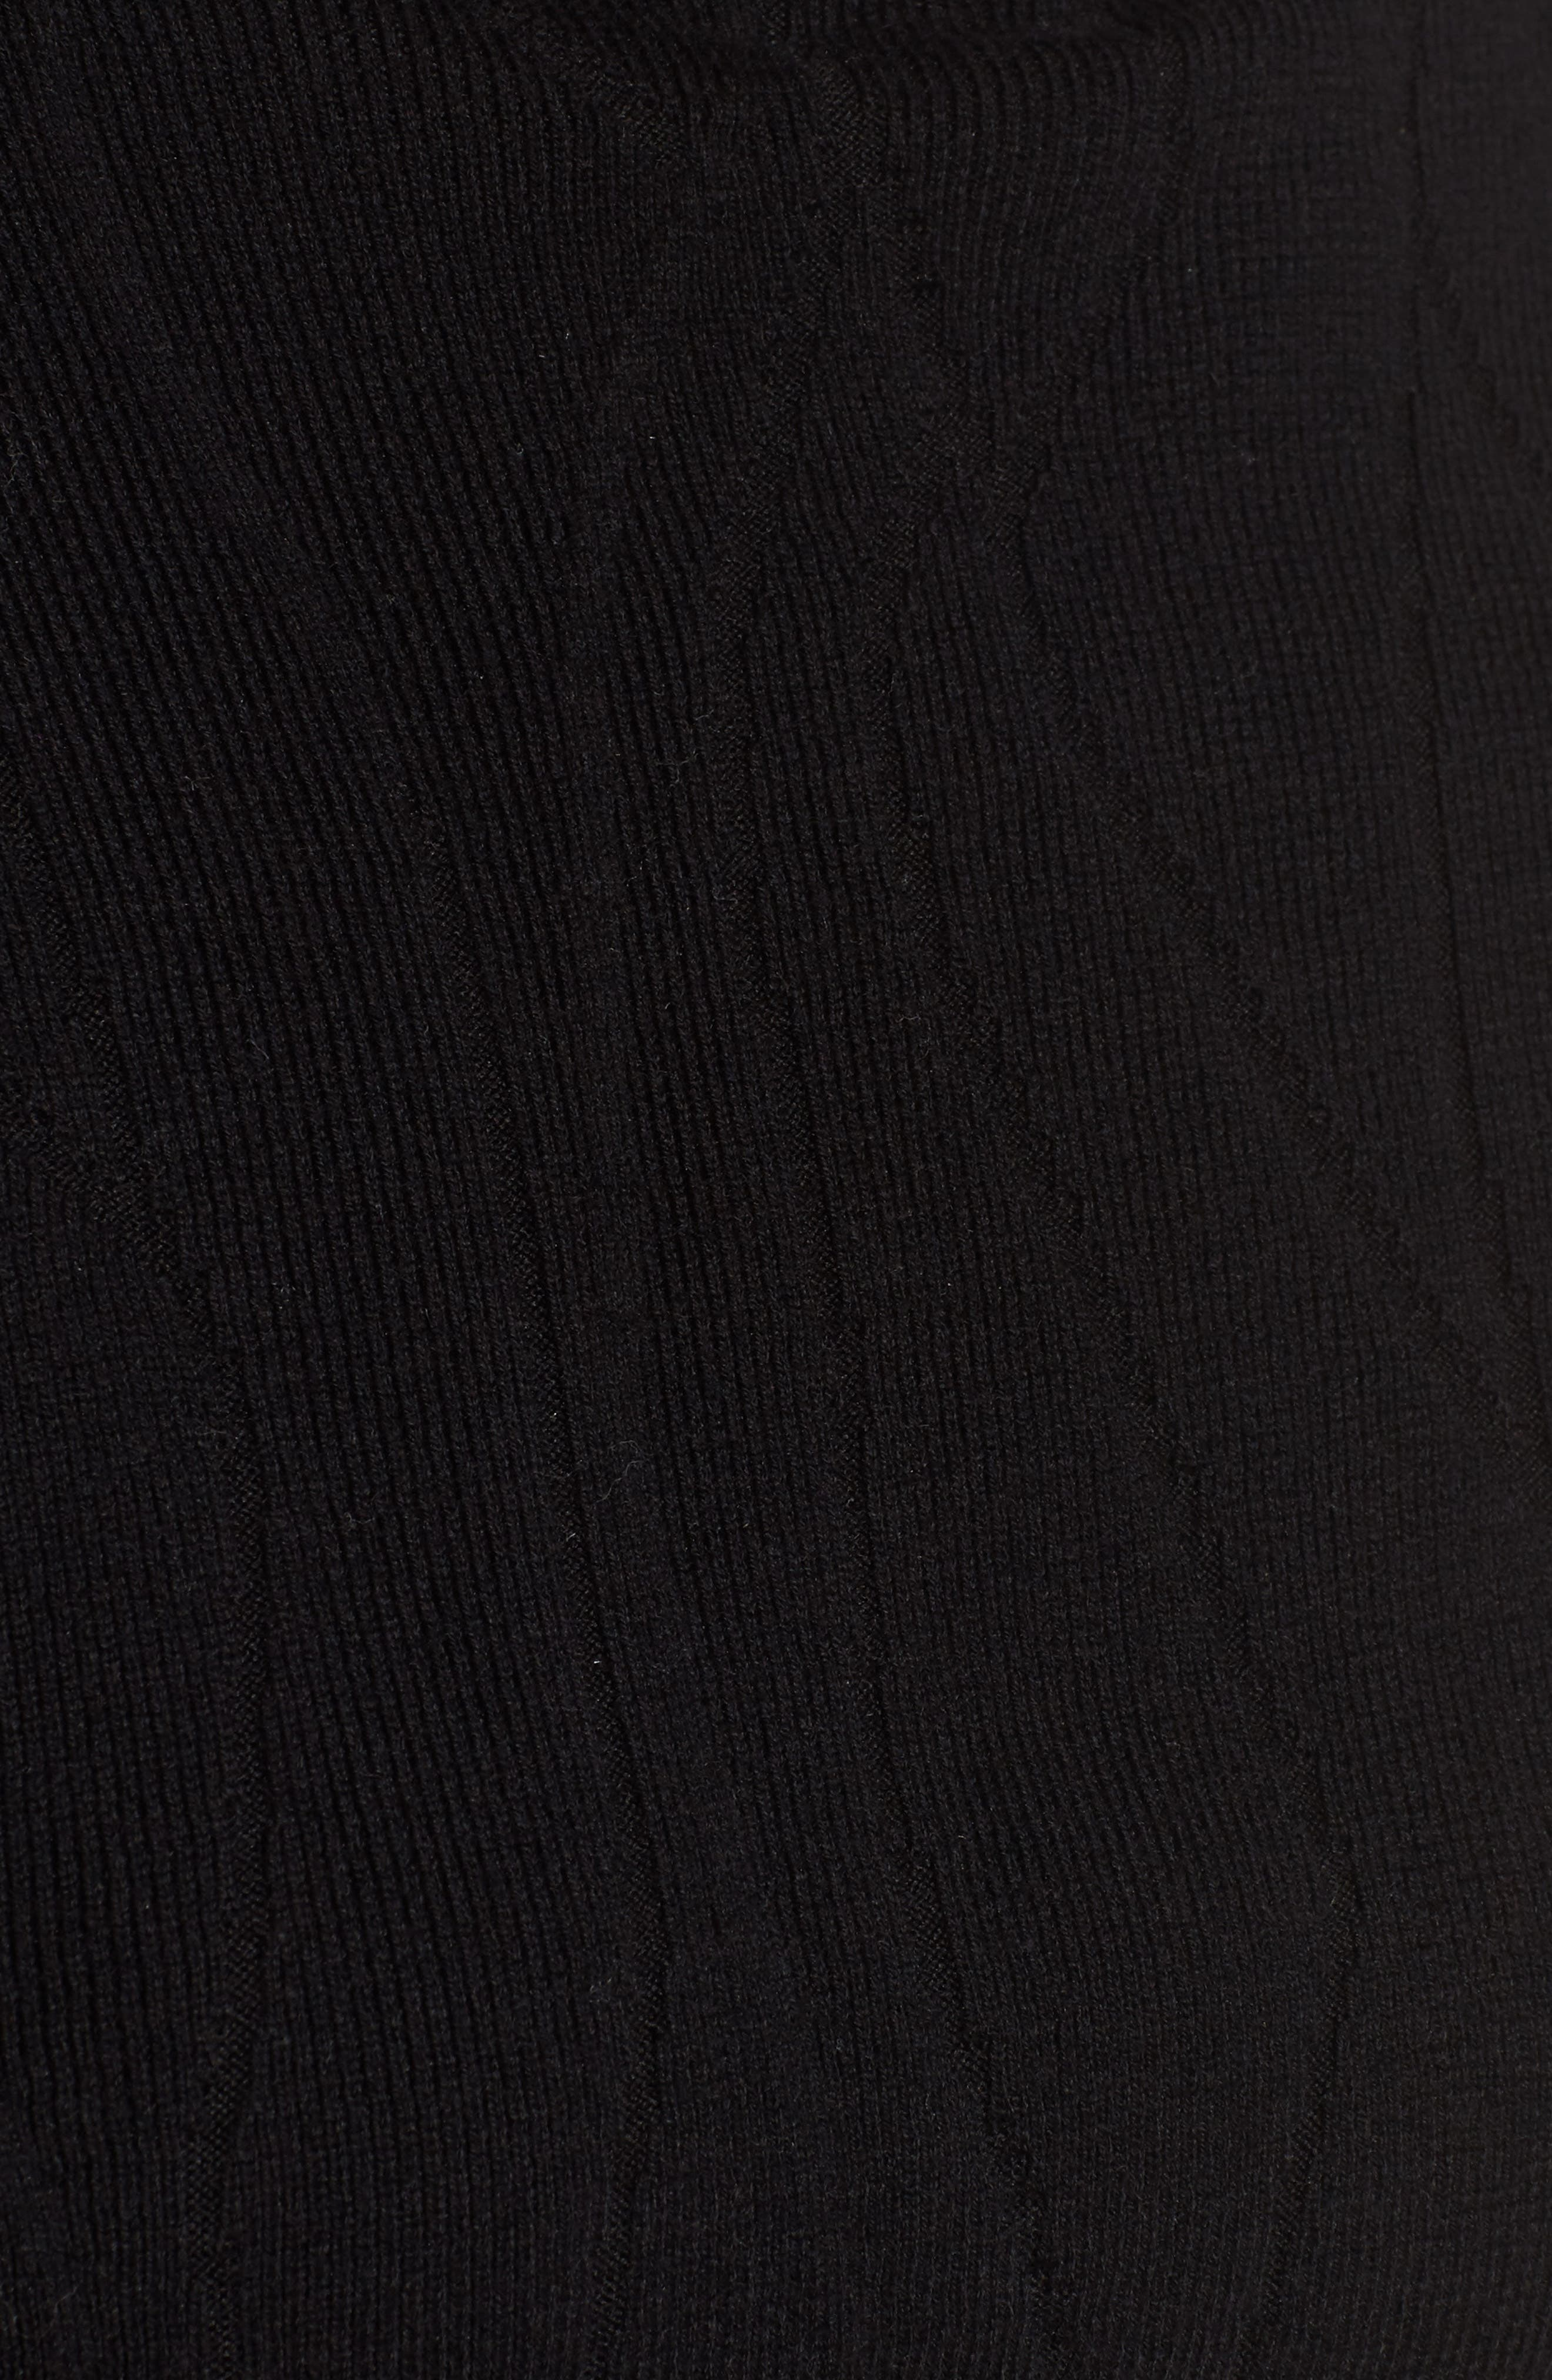 Artisanal Crackle Jacquard Sweater,                             Alternate thumbnail 5, color,                             004